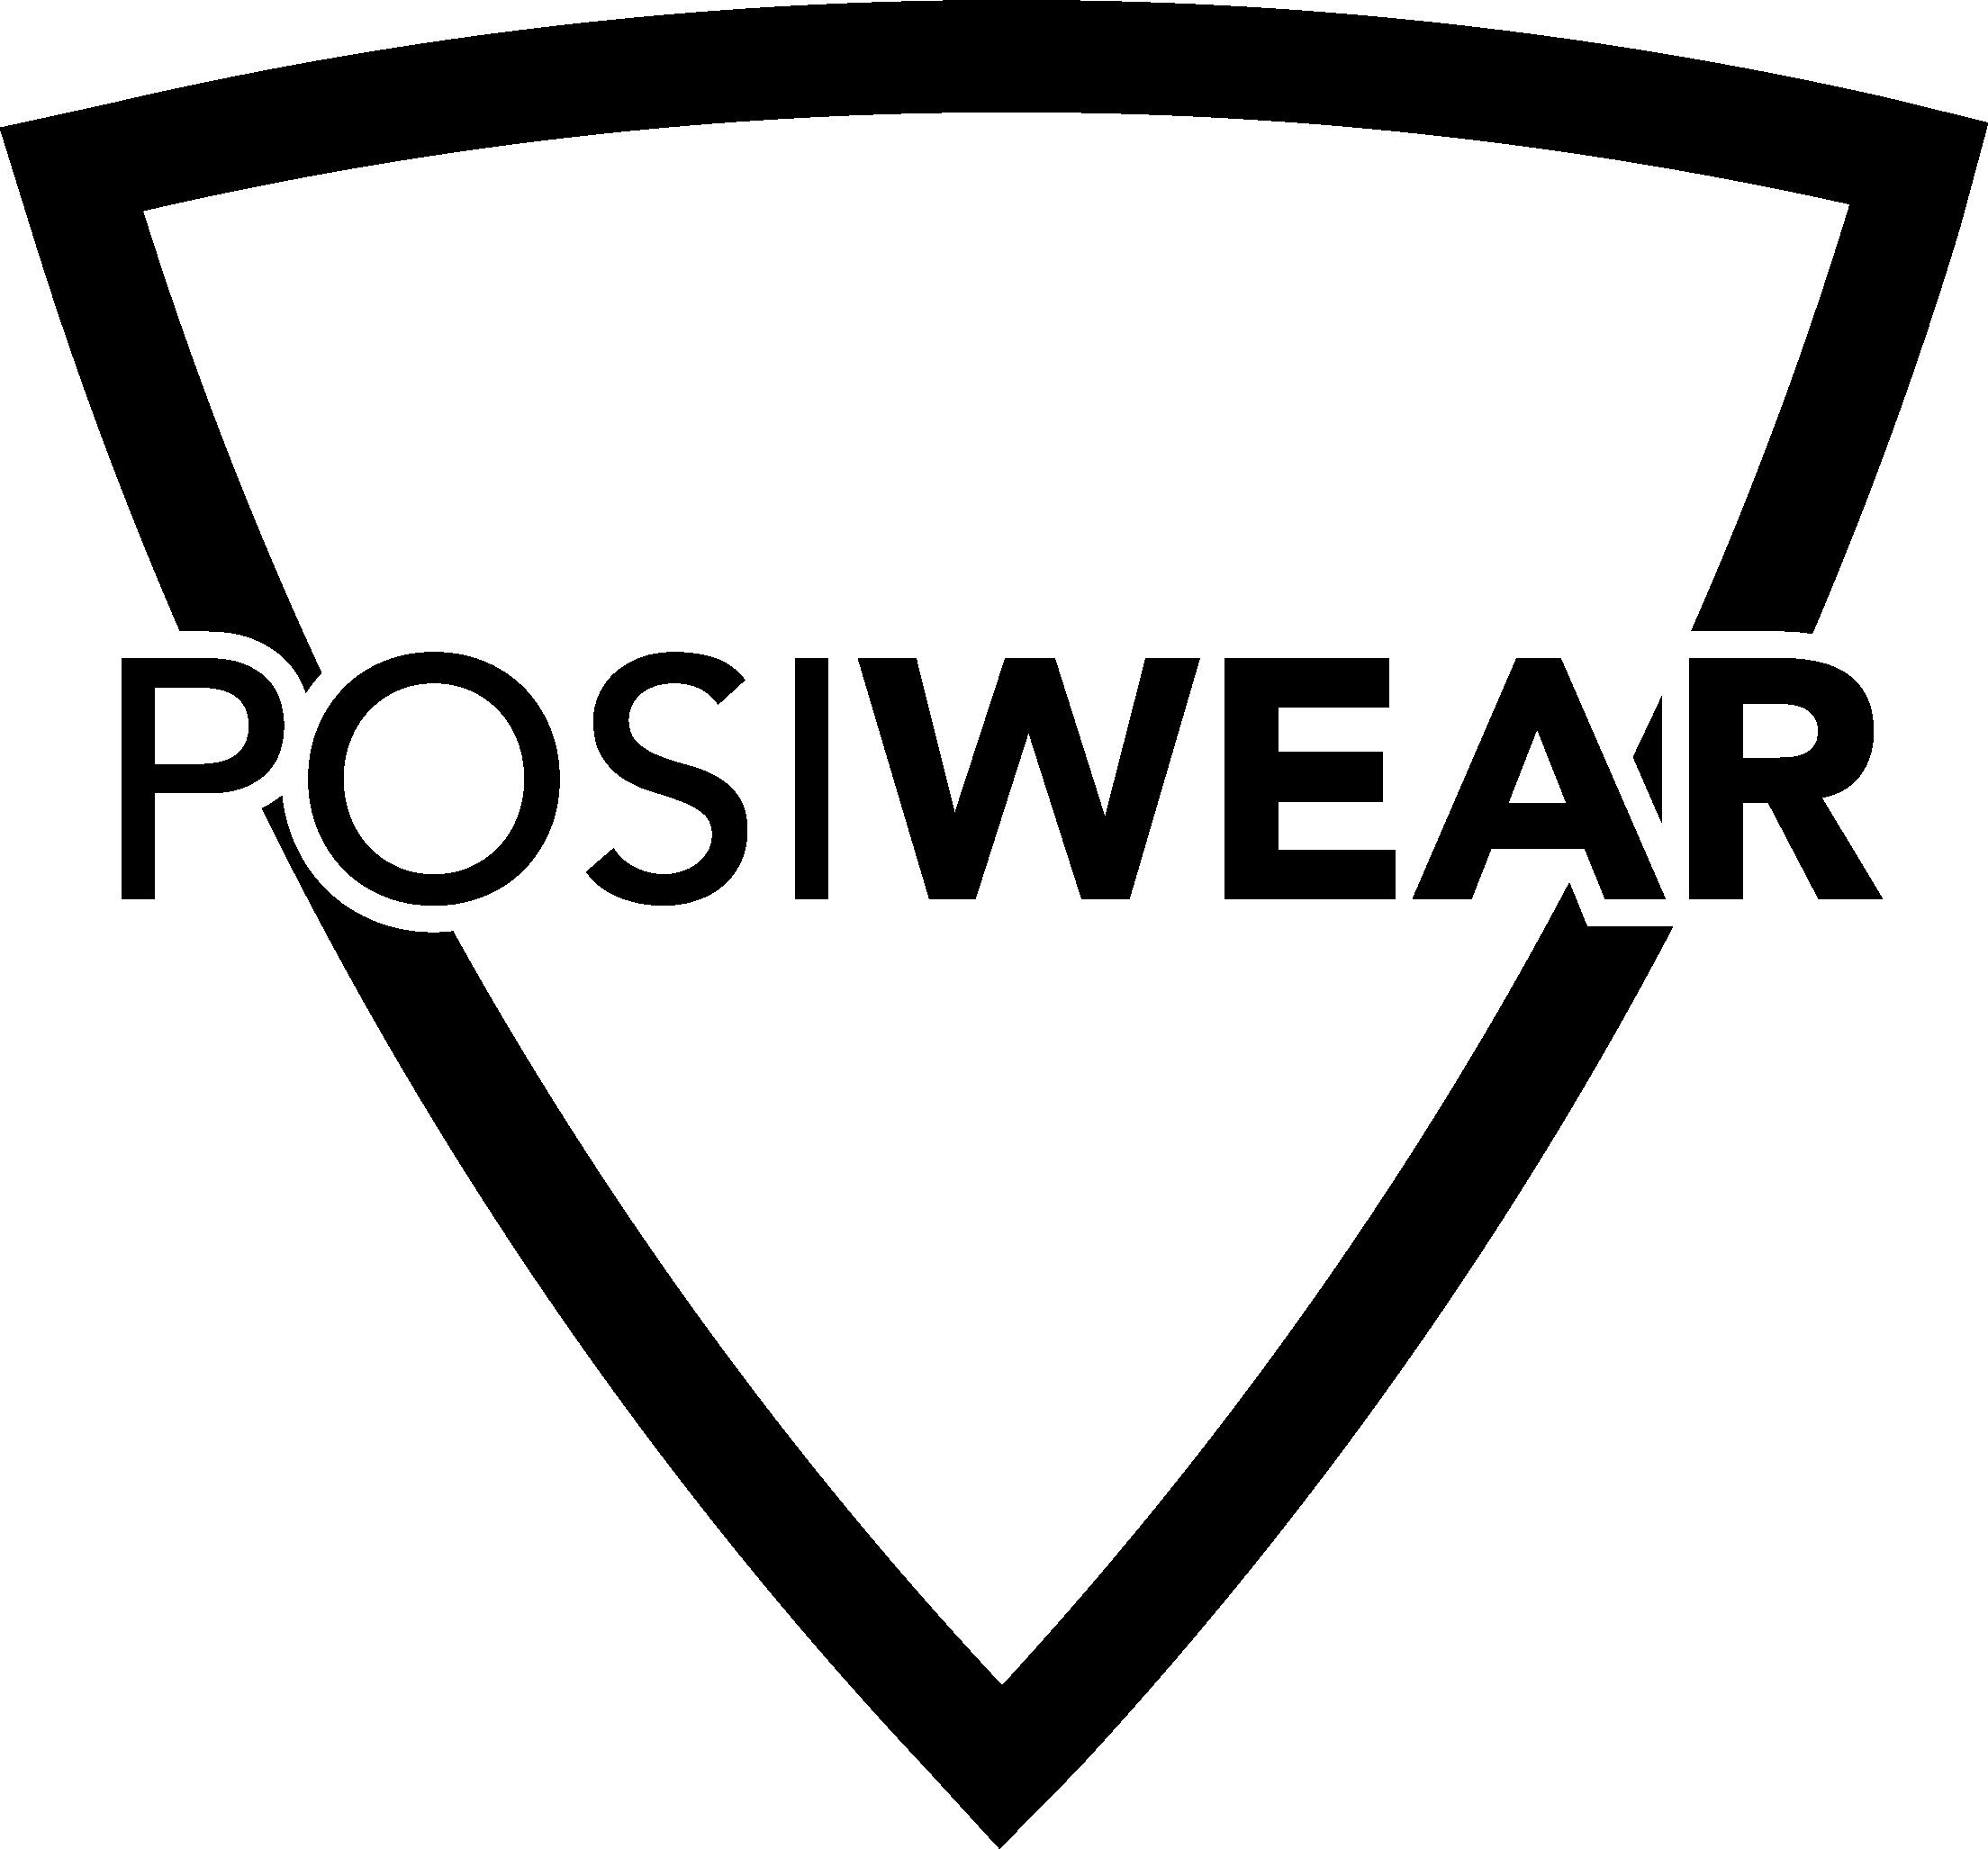 Posiwear logo